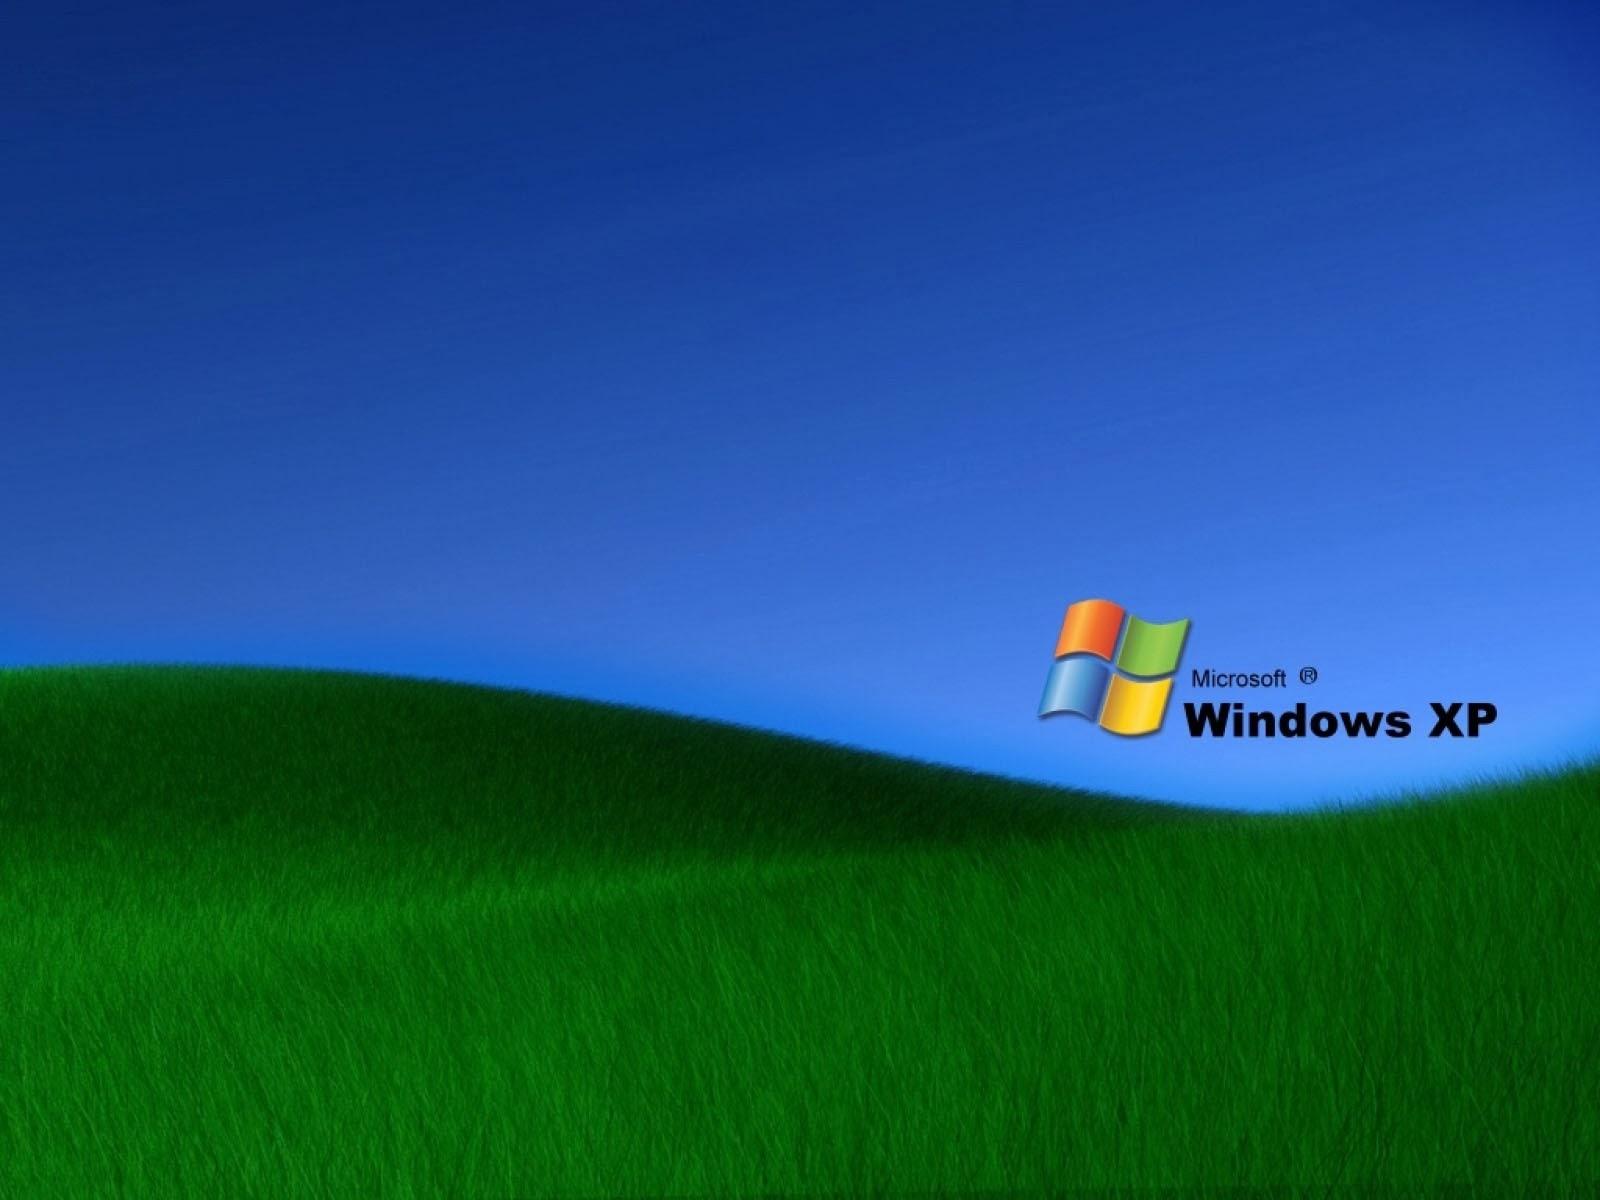 Windows Vista Computer wallpapers Crazy Frankenstein